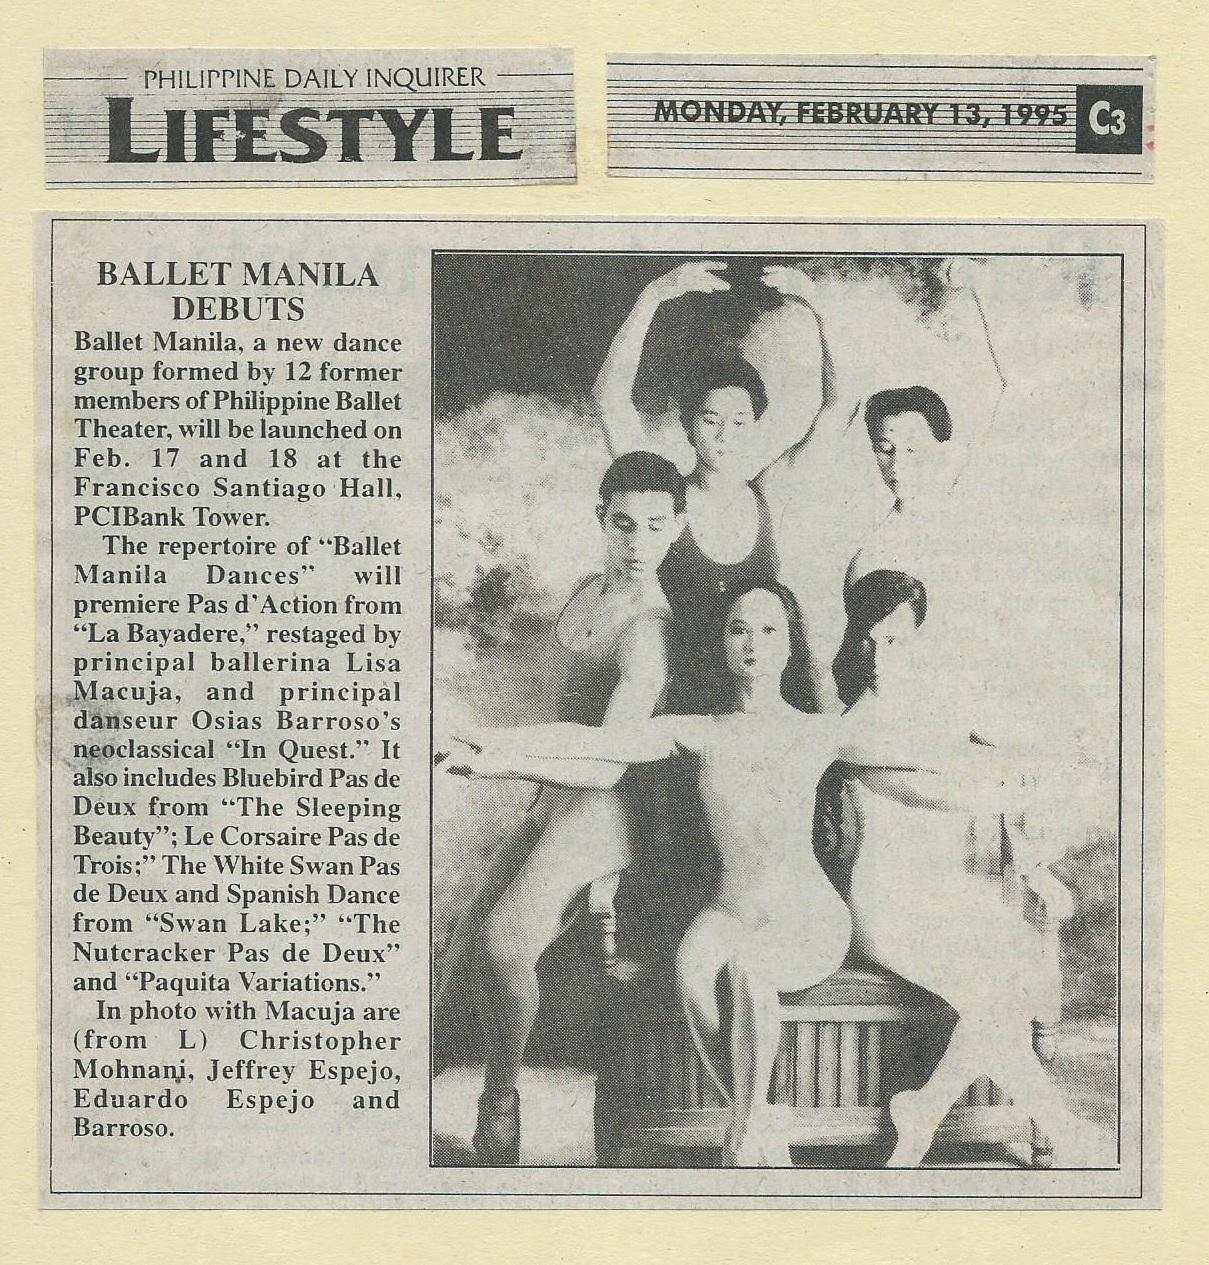 Ballet Manila Debuts